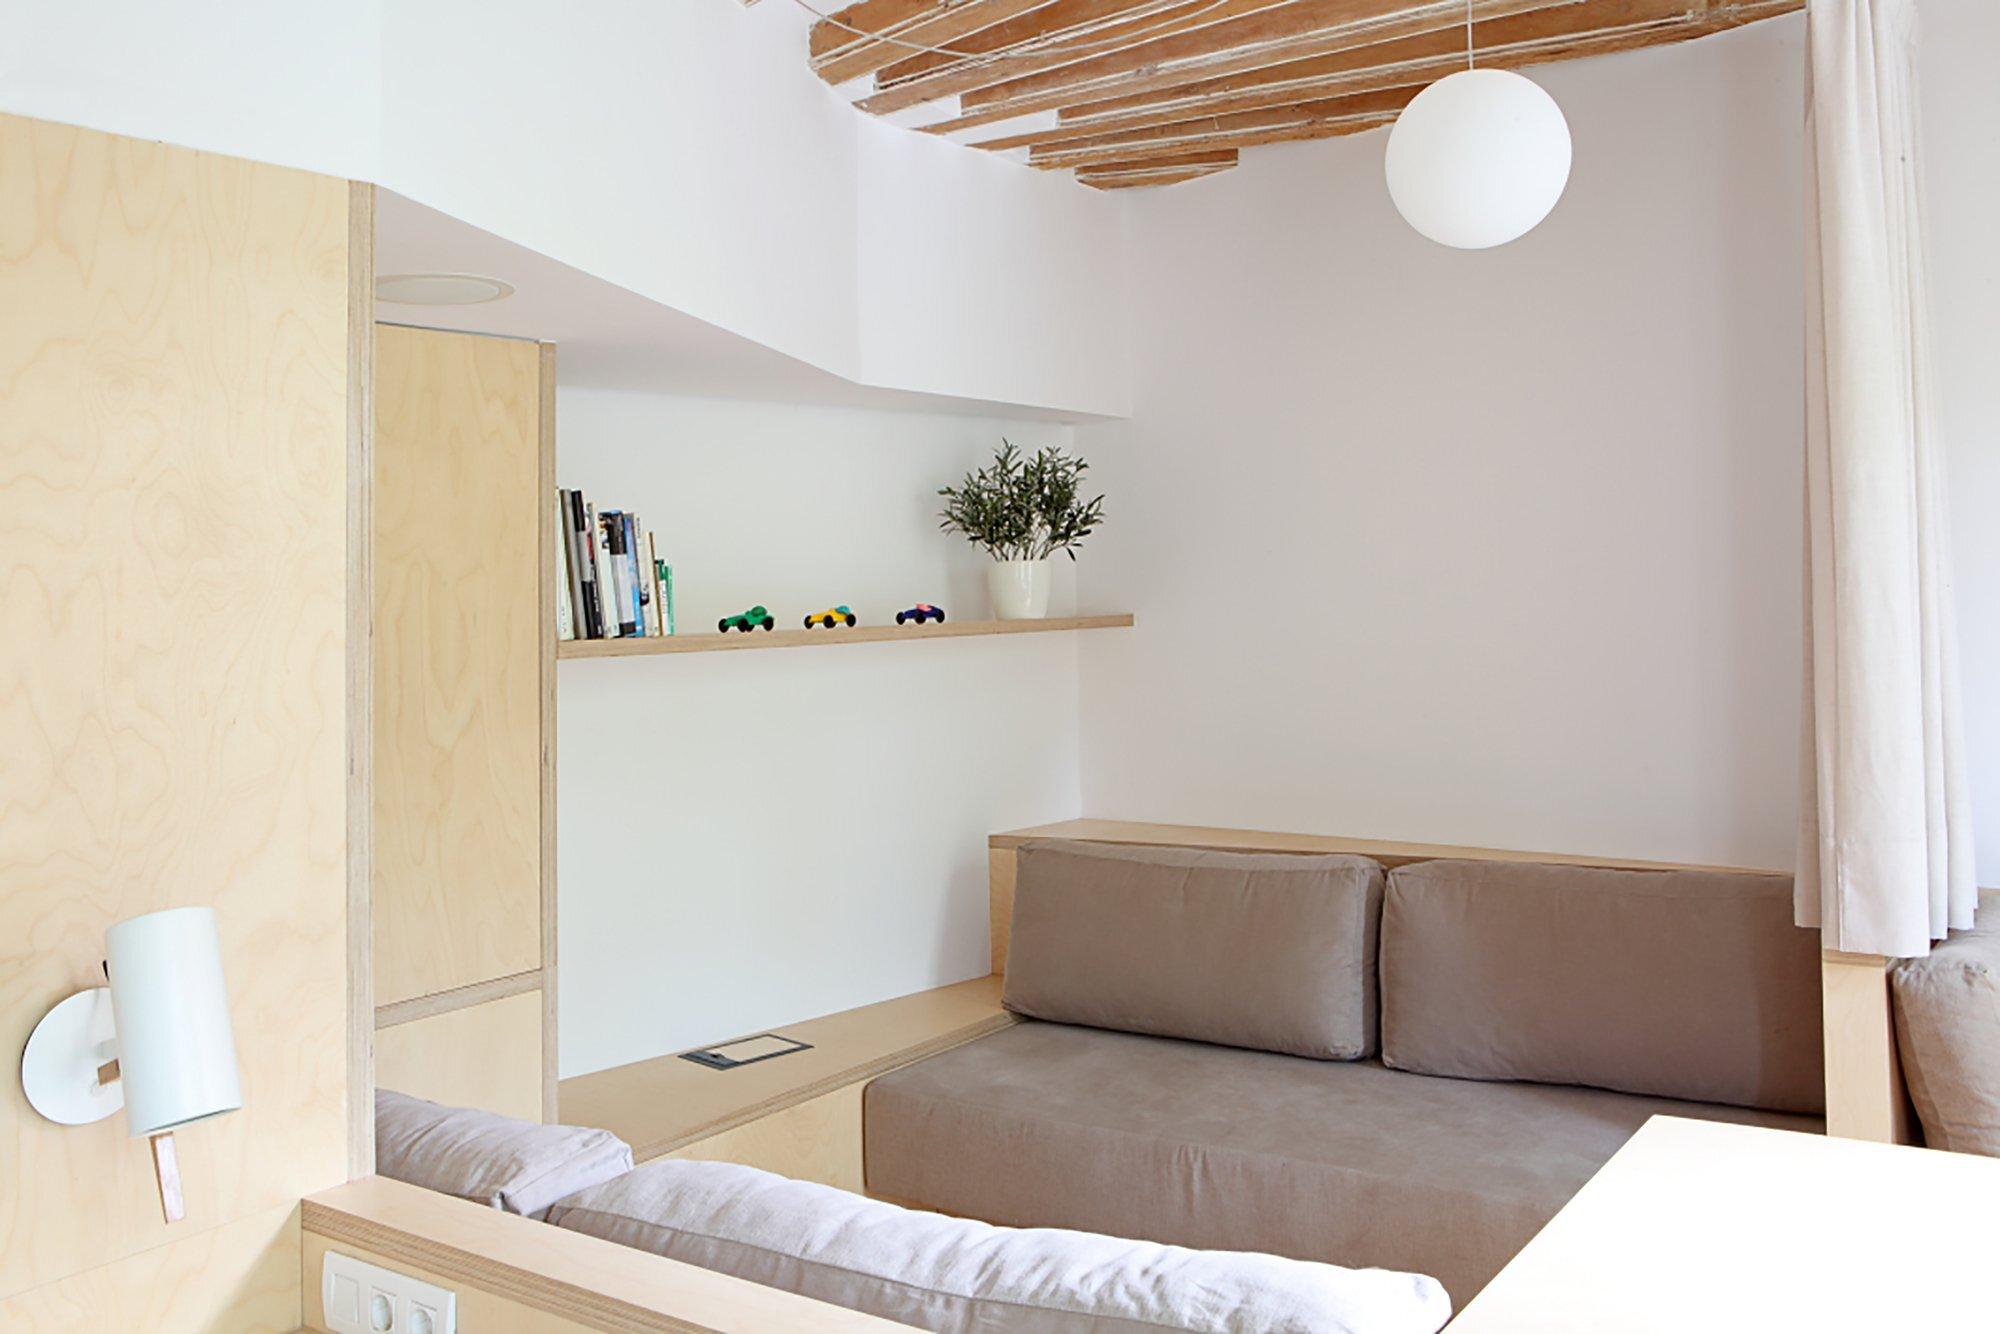 Apartment Pujades11 - Small Apartment - Miel Arquitectos + Studio P10 - Spain - Living Room - Humble Homes